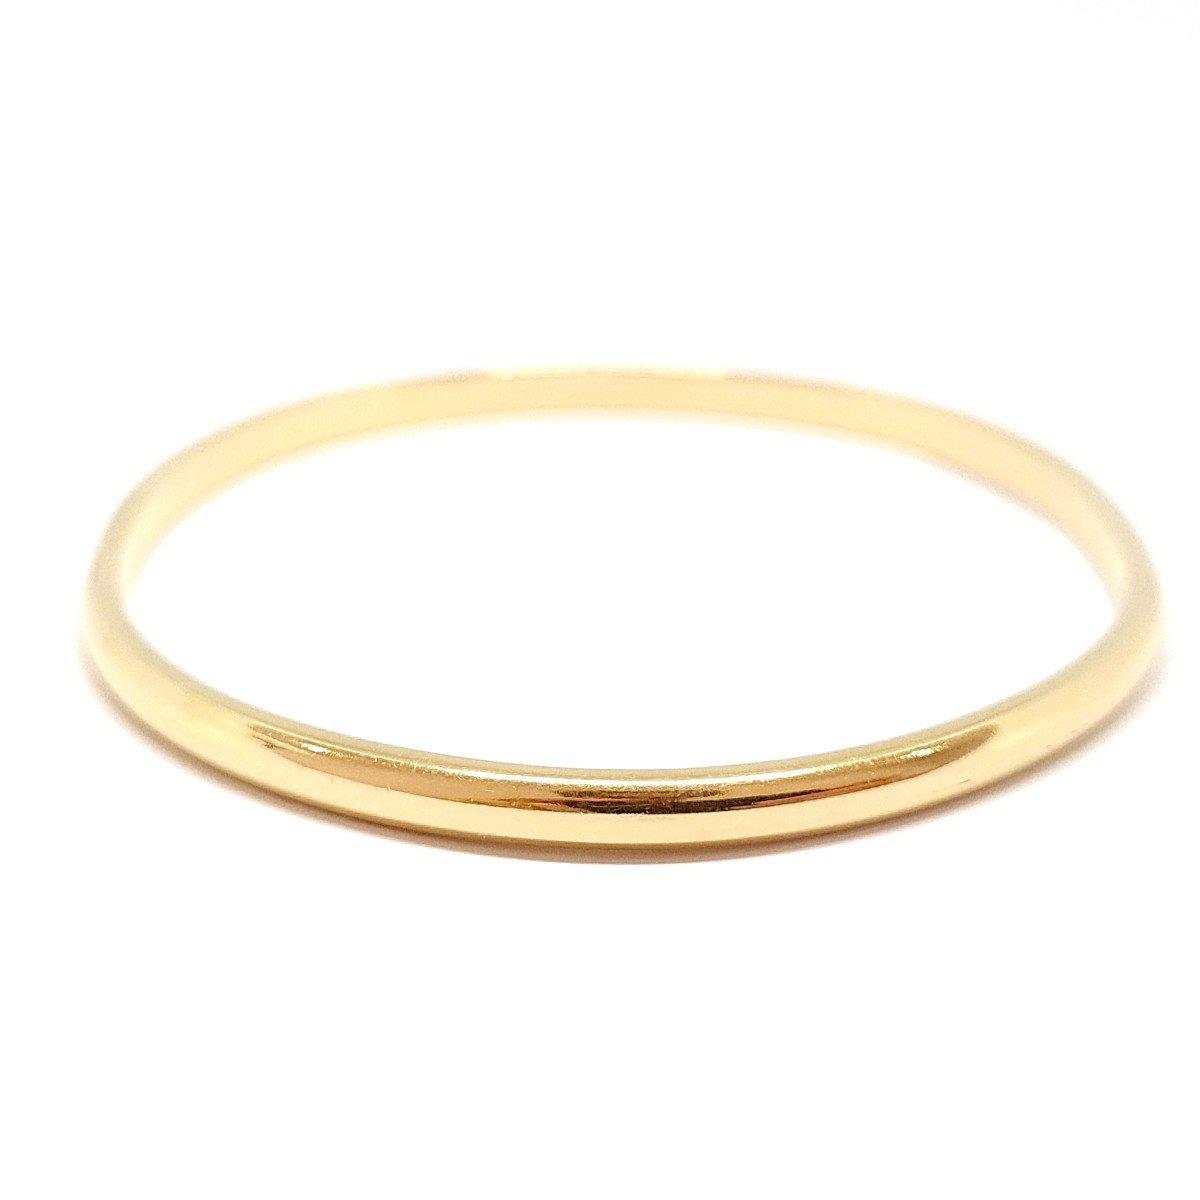 18k Yellow Gold Rigid Bangle Bracelet-photo-4